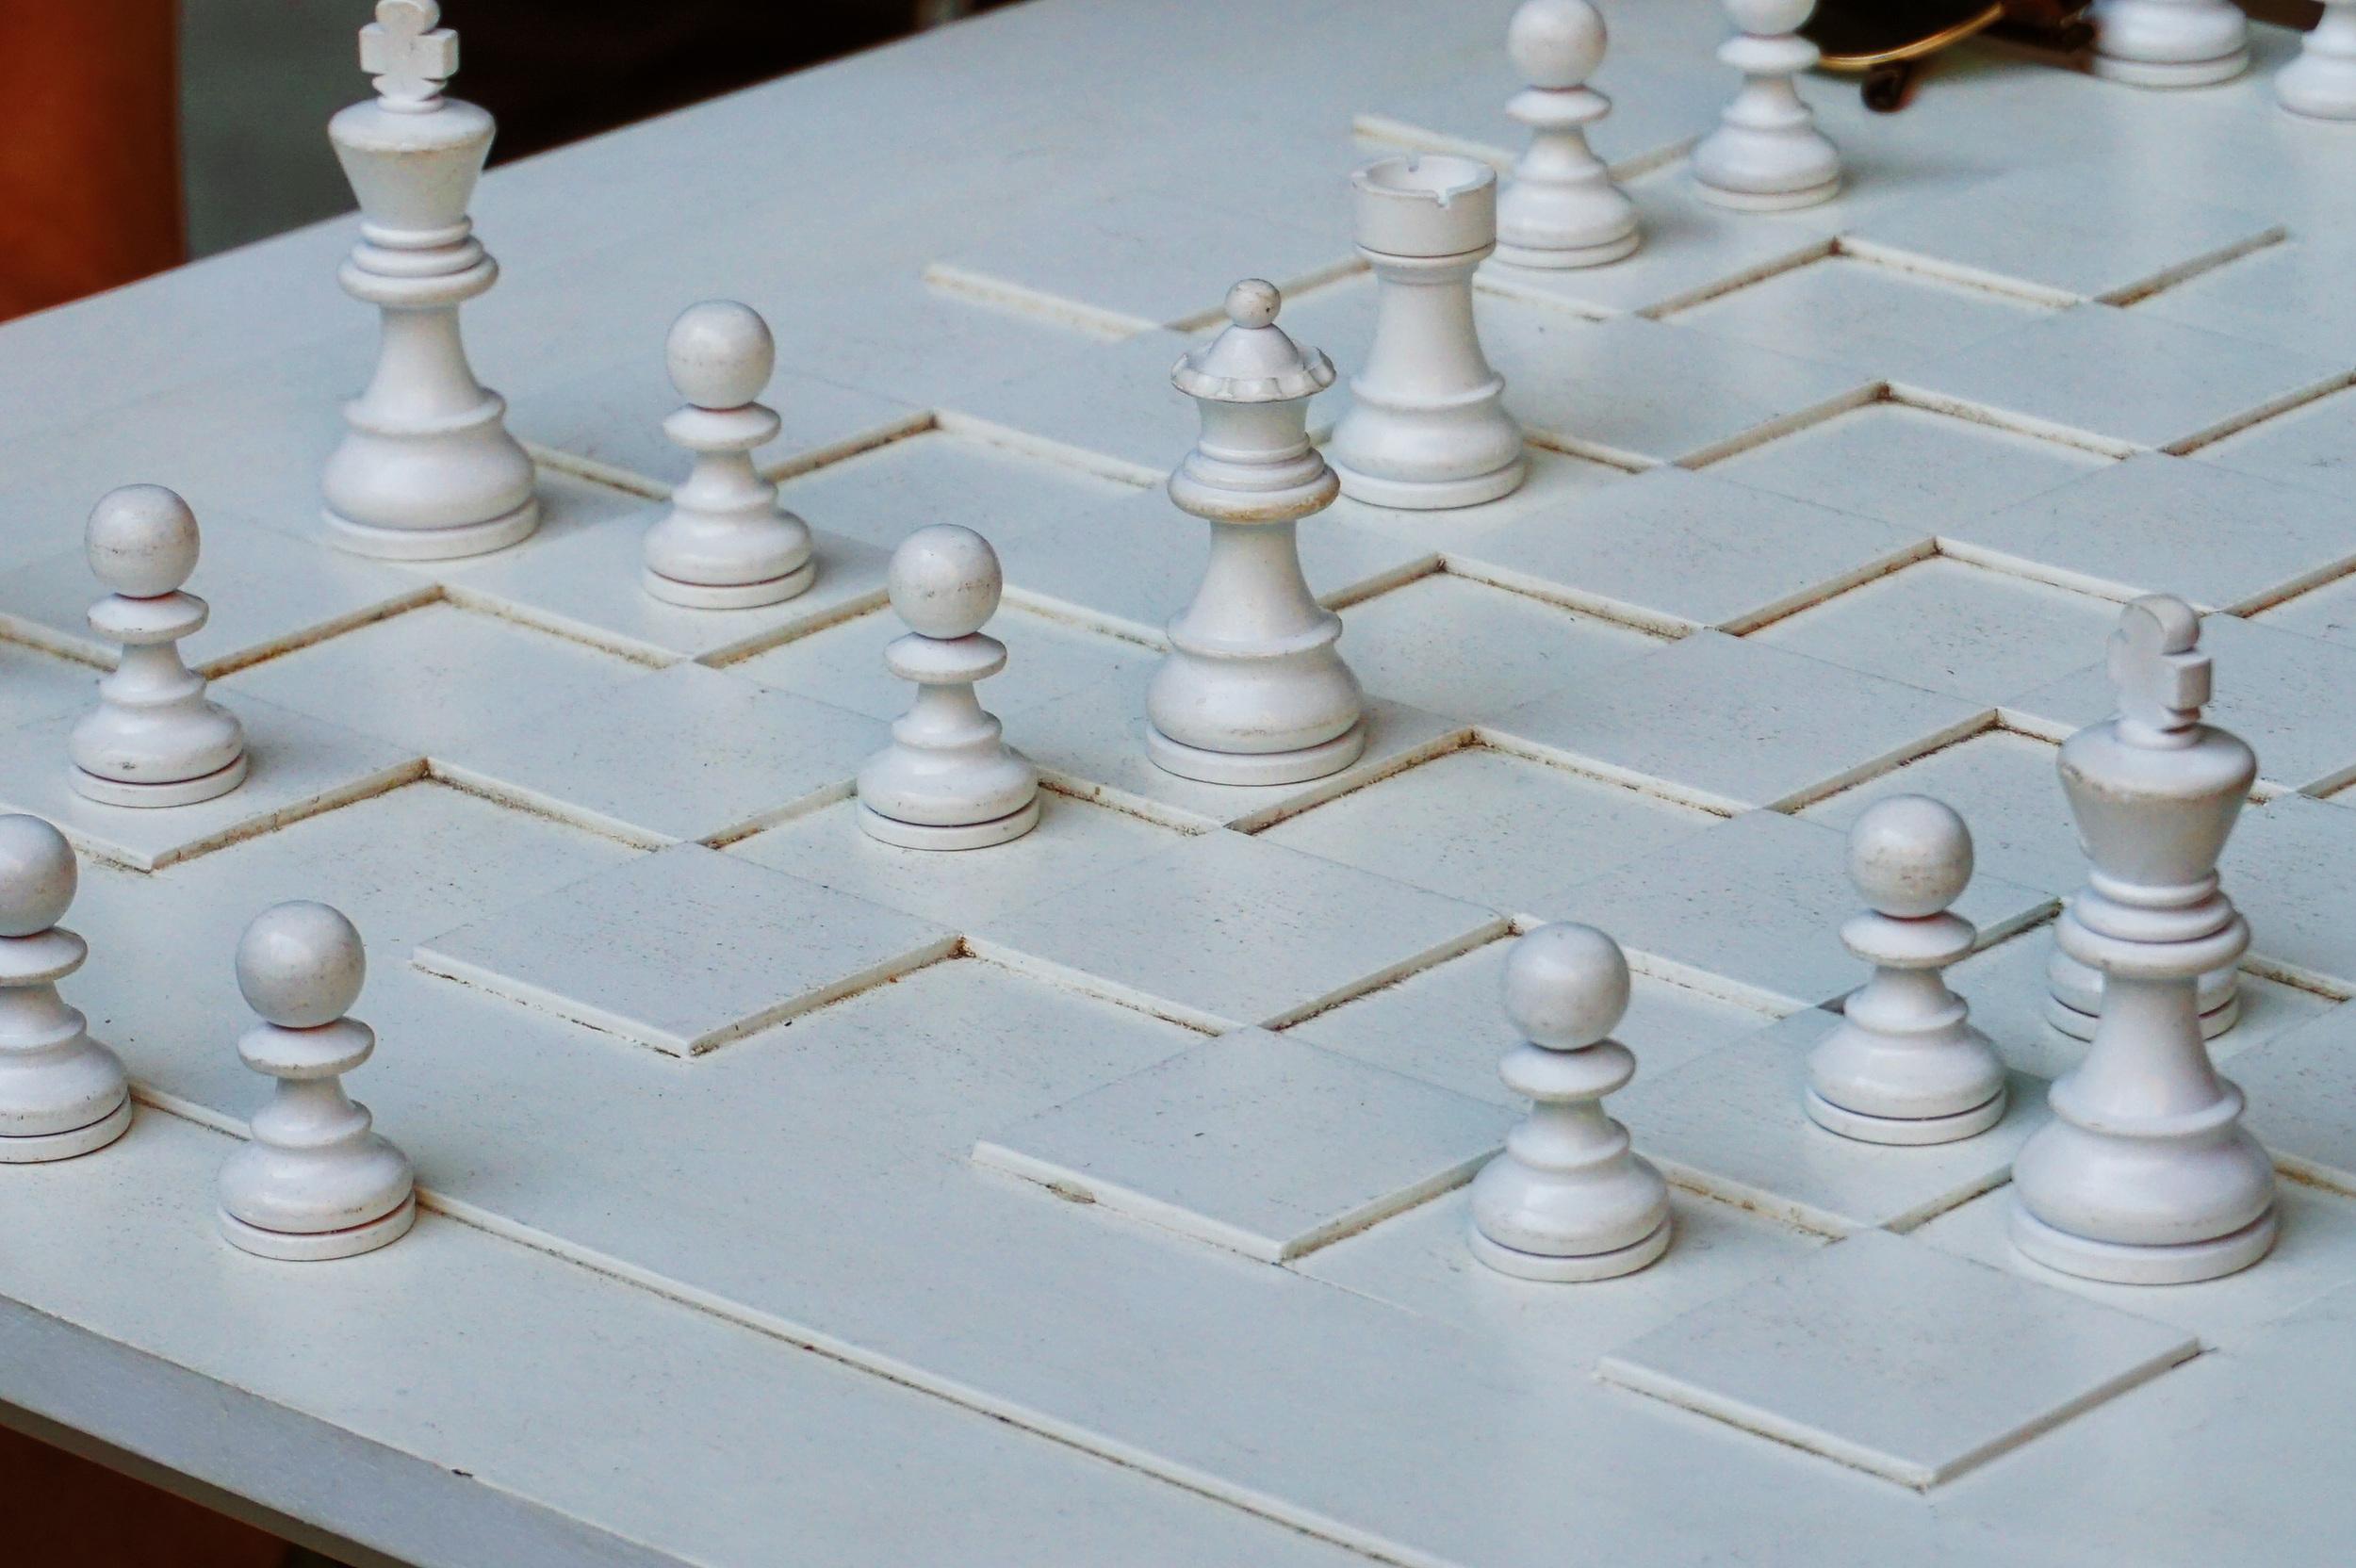 Yoko Ono's white chess set